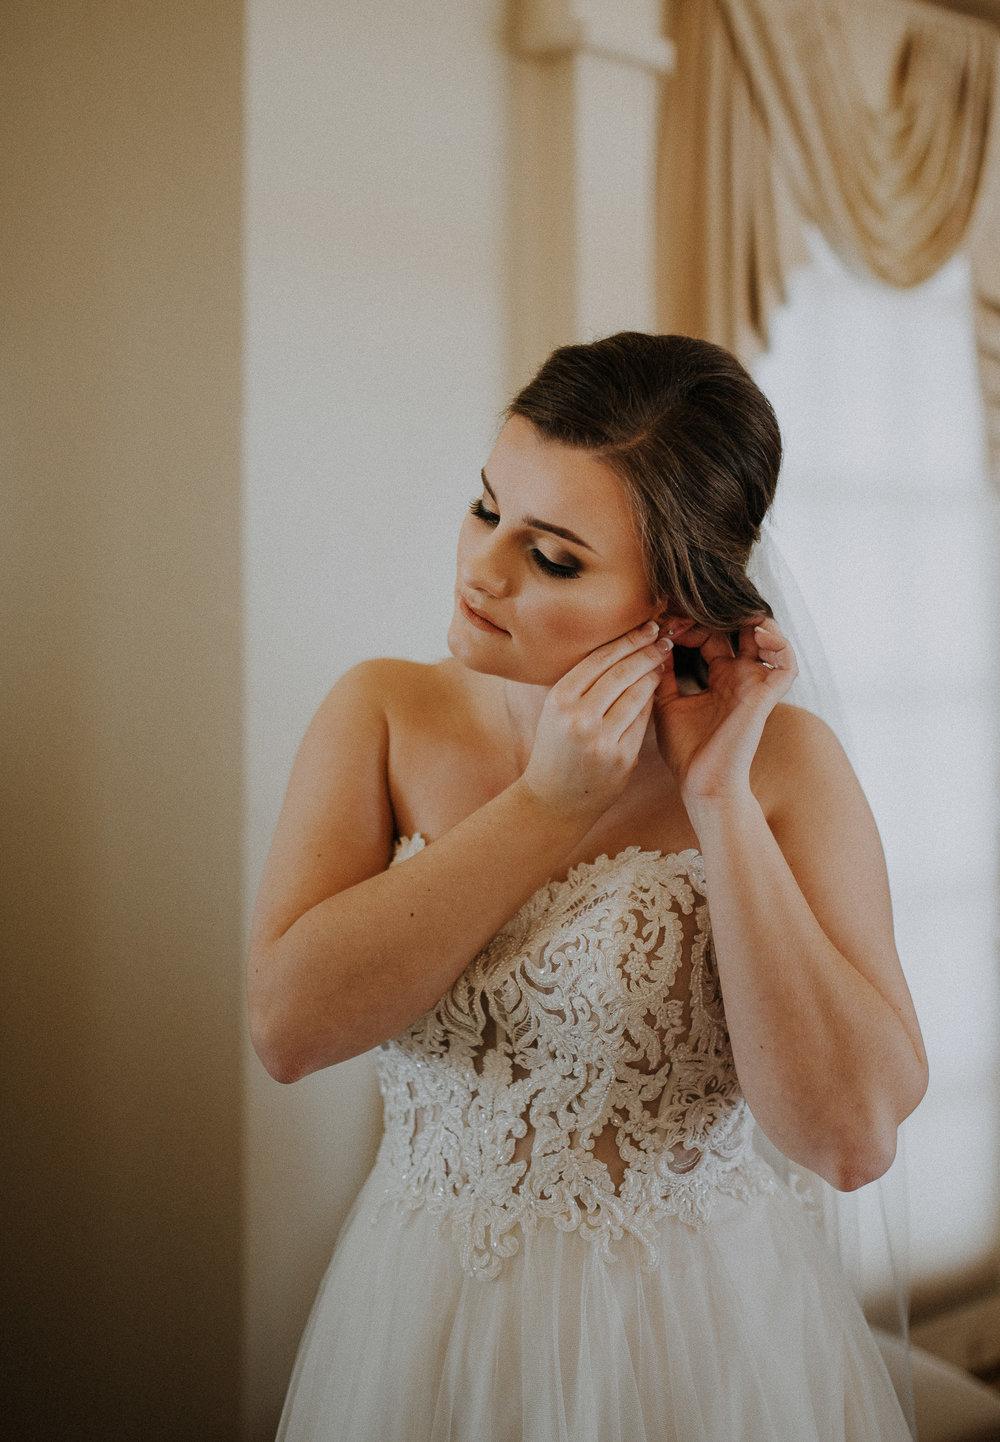 Dallas_Fort_Worth_wedding_Photographer_lone_star_mansion_burleson_texas_49